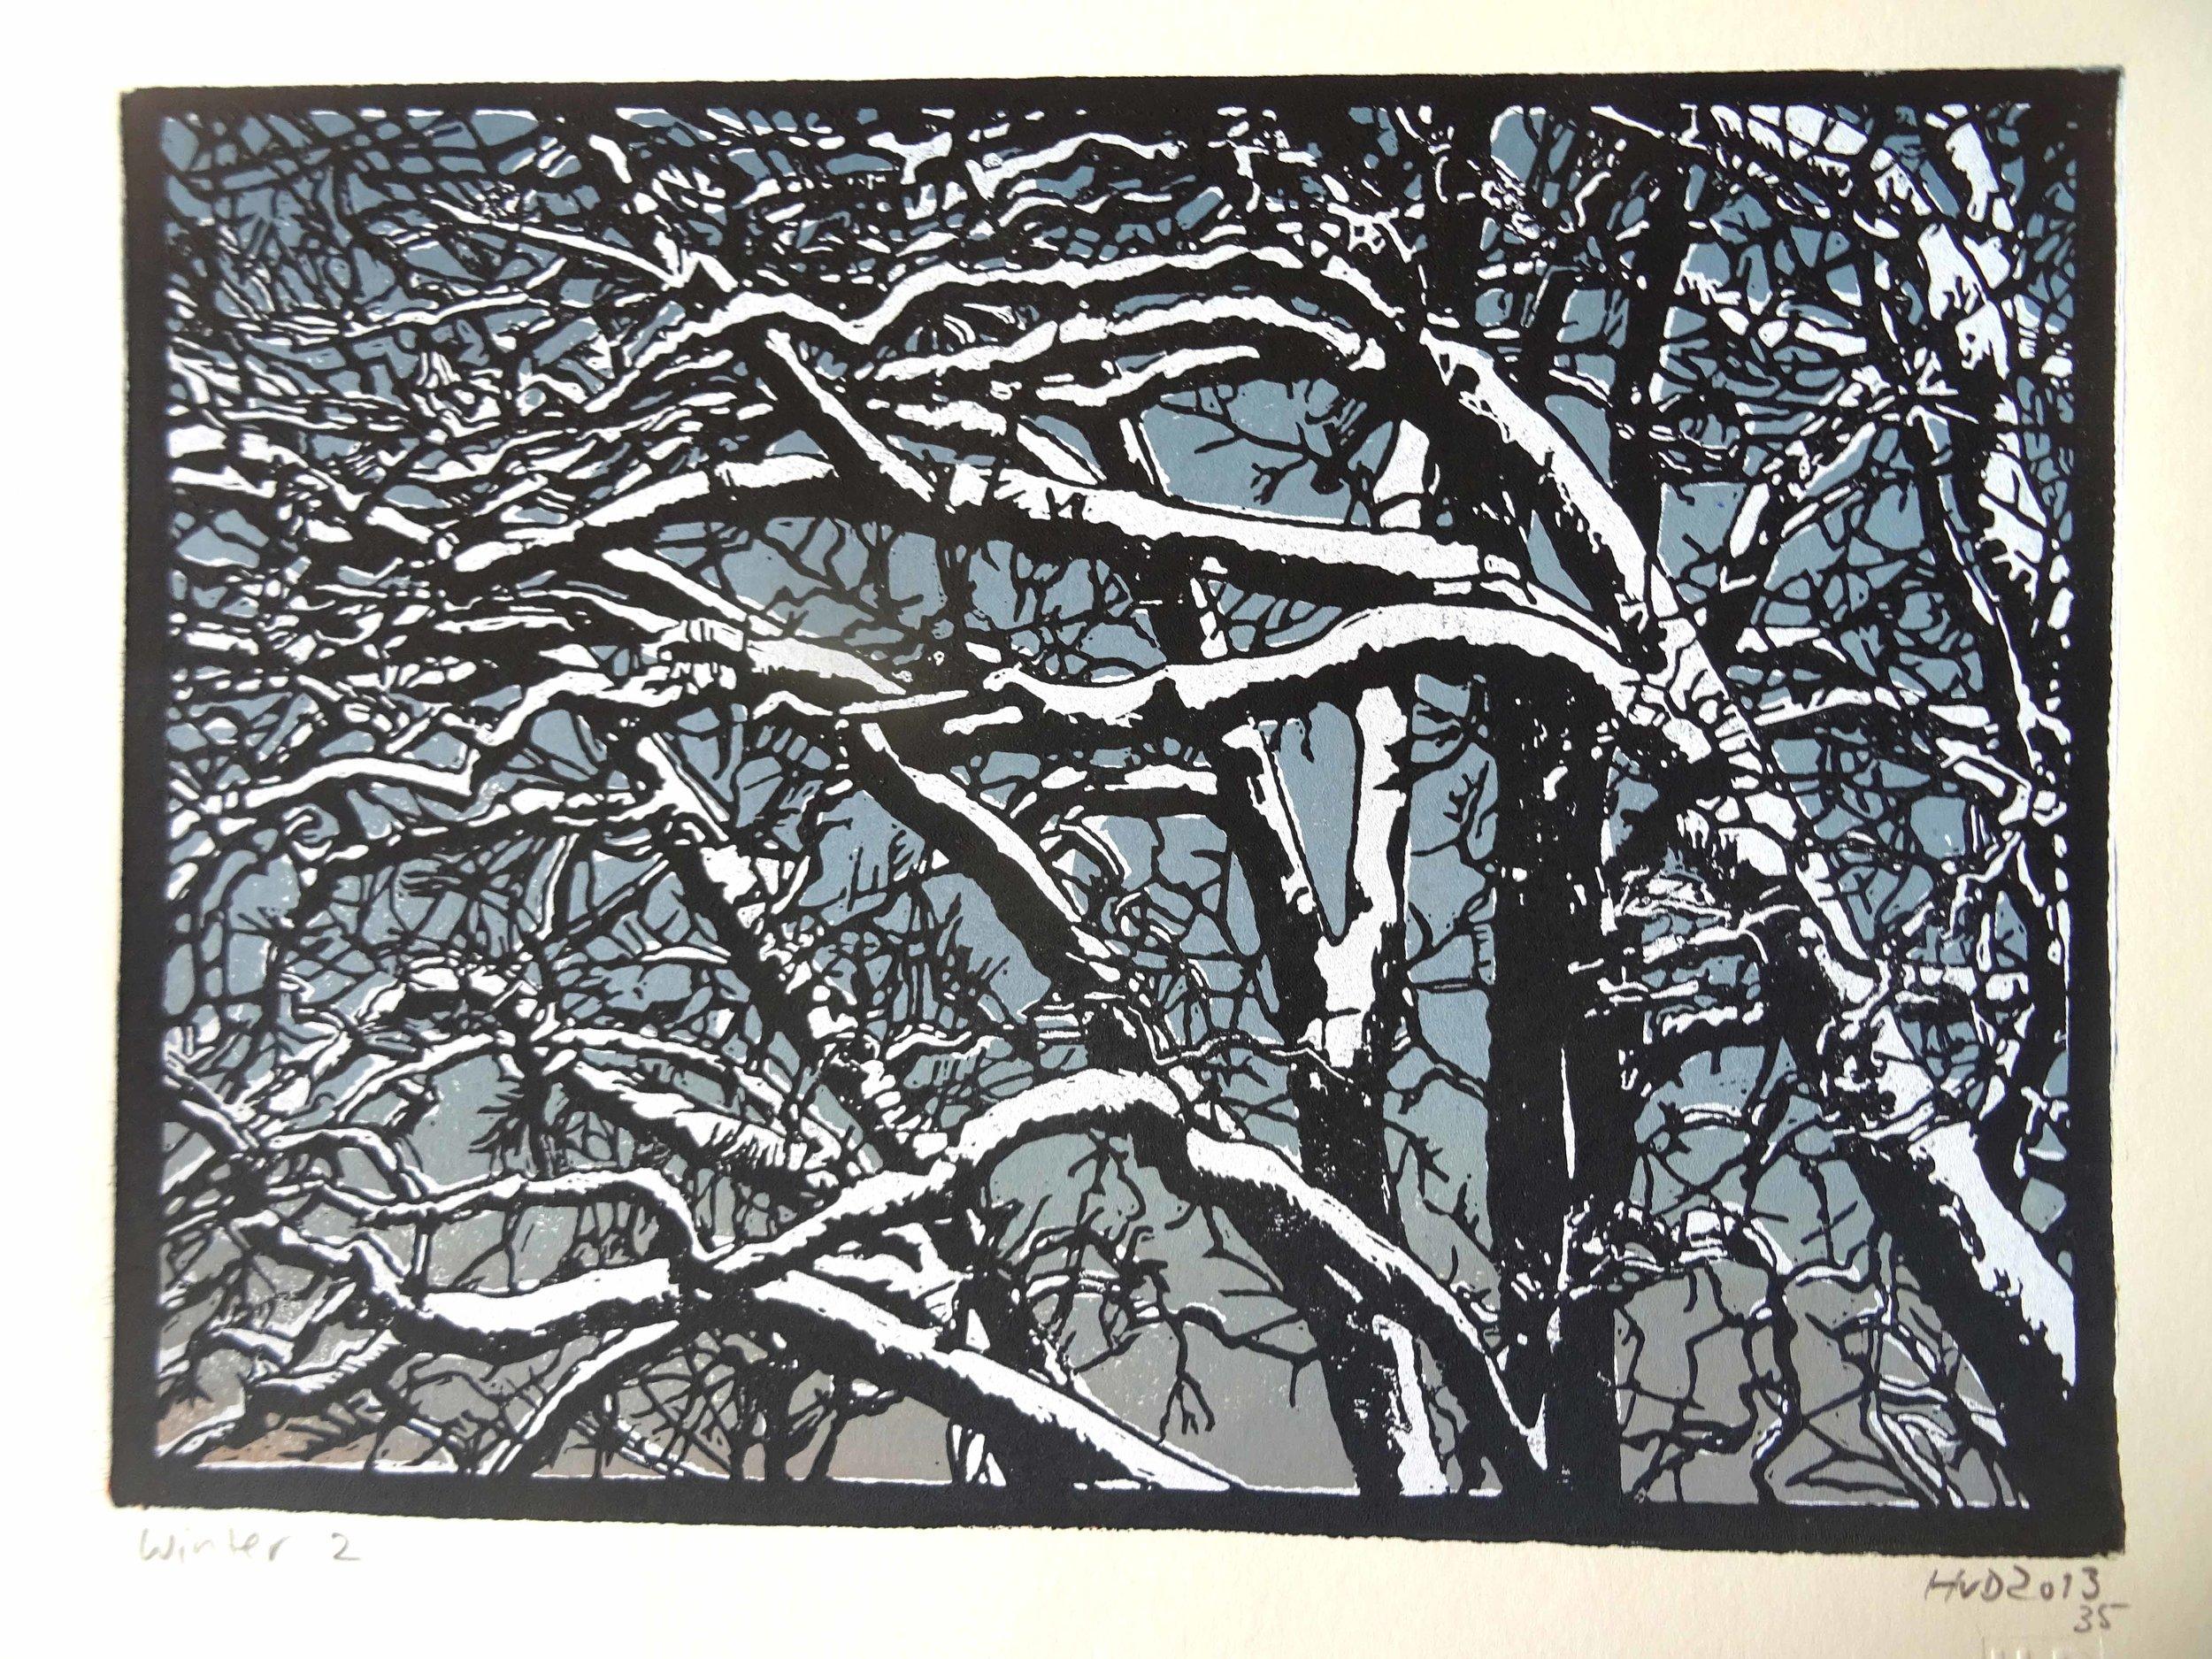 135-4, winter trees, 21x30 cm, 3-plate lino, 80 €